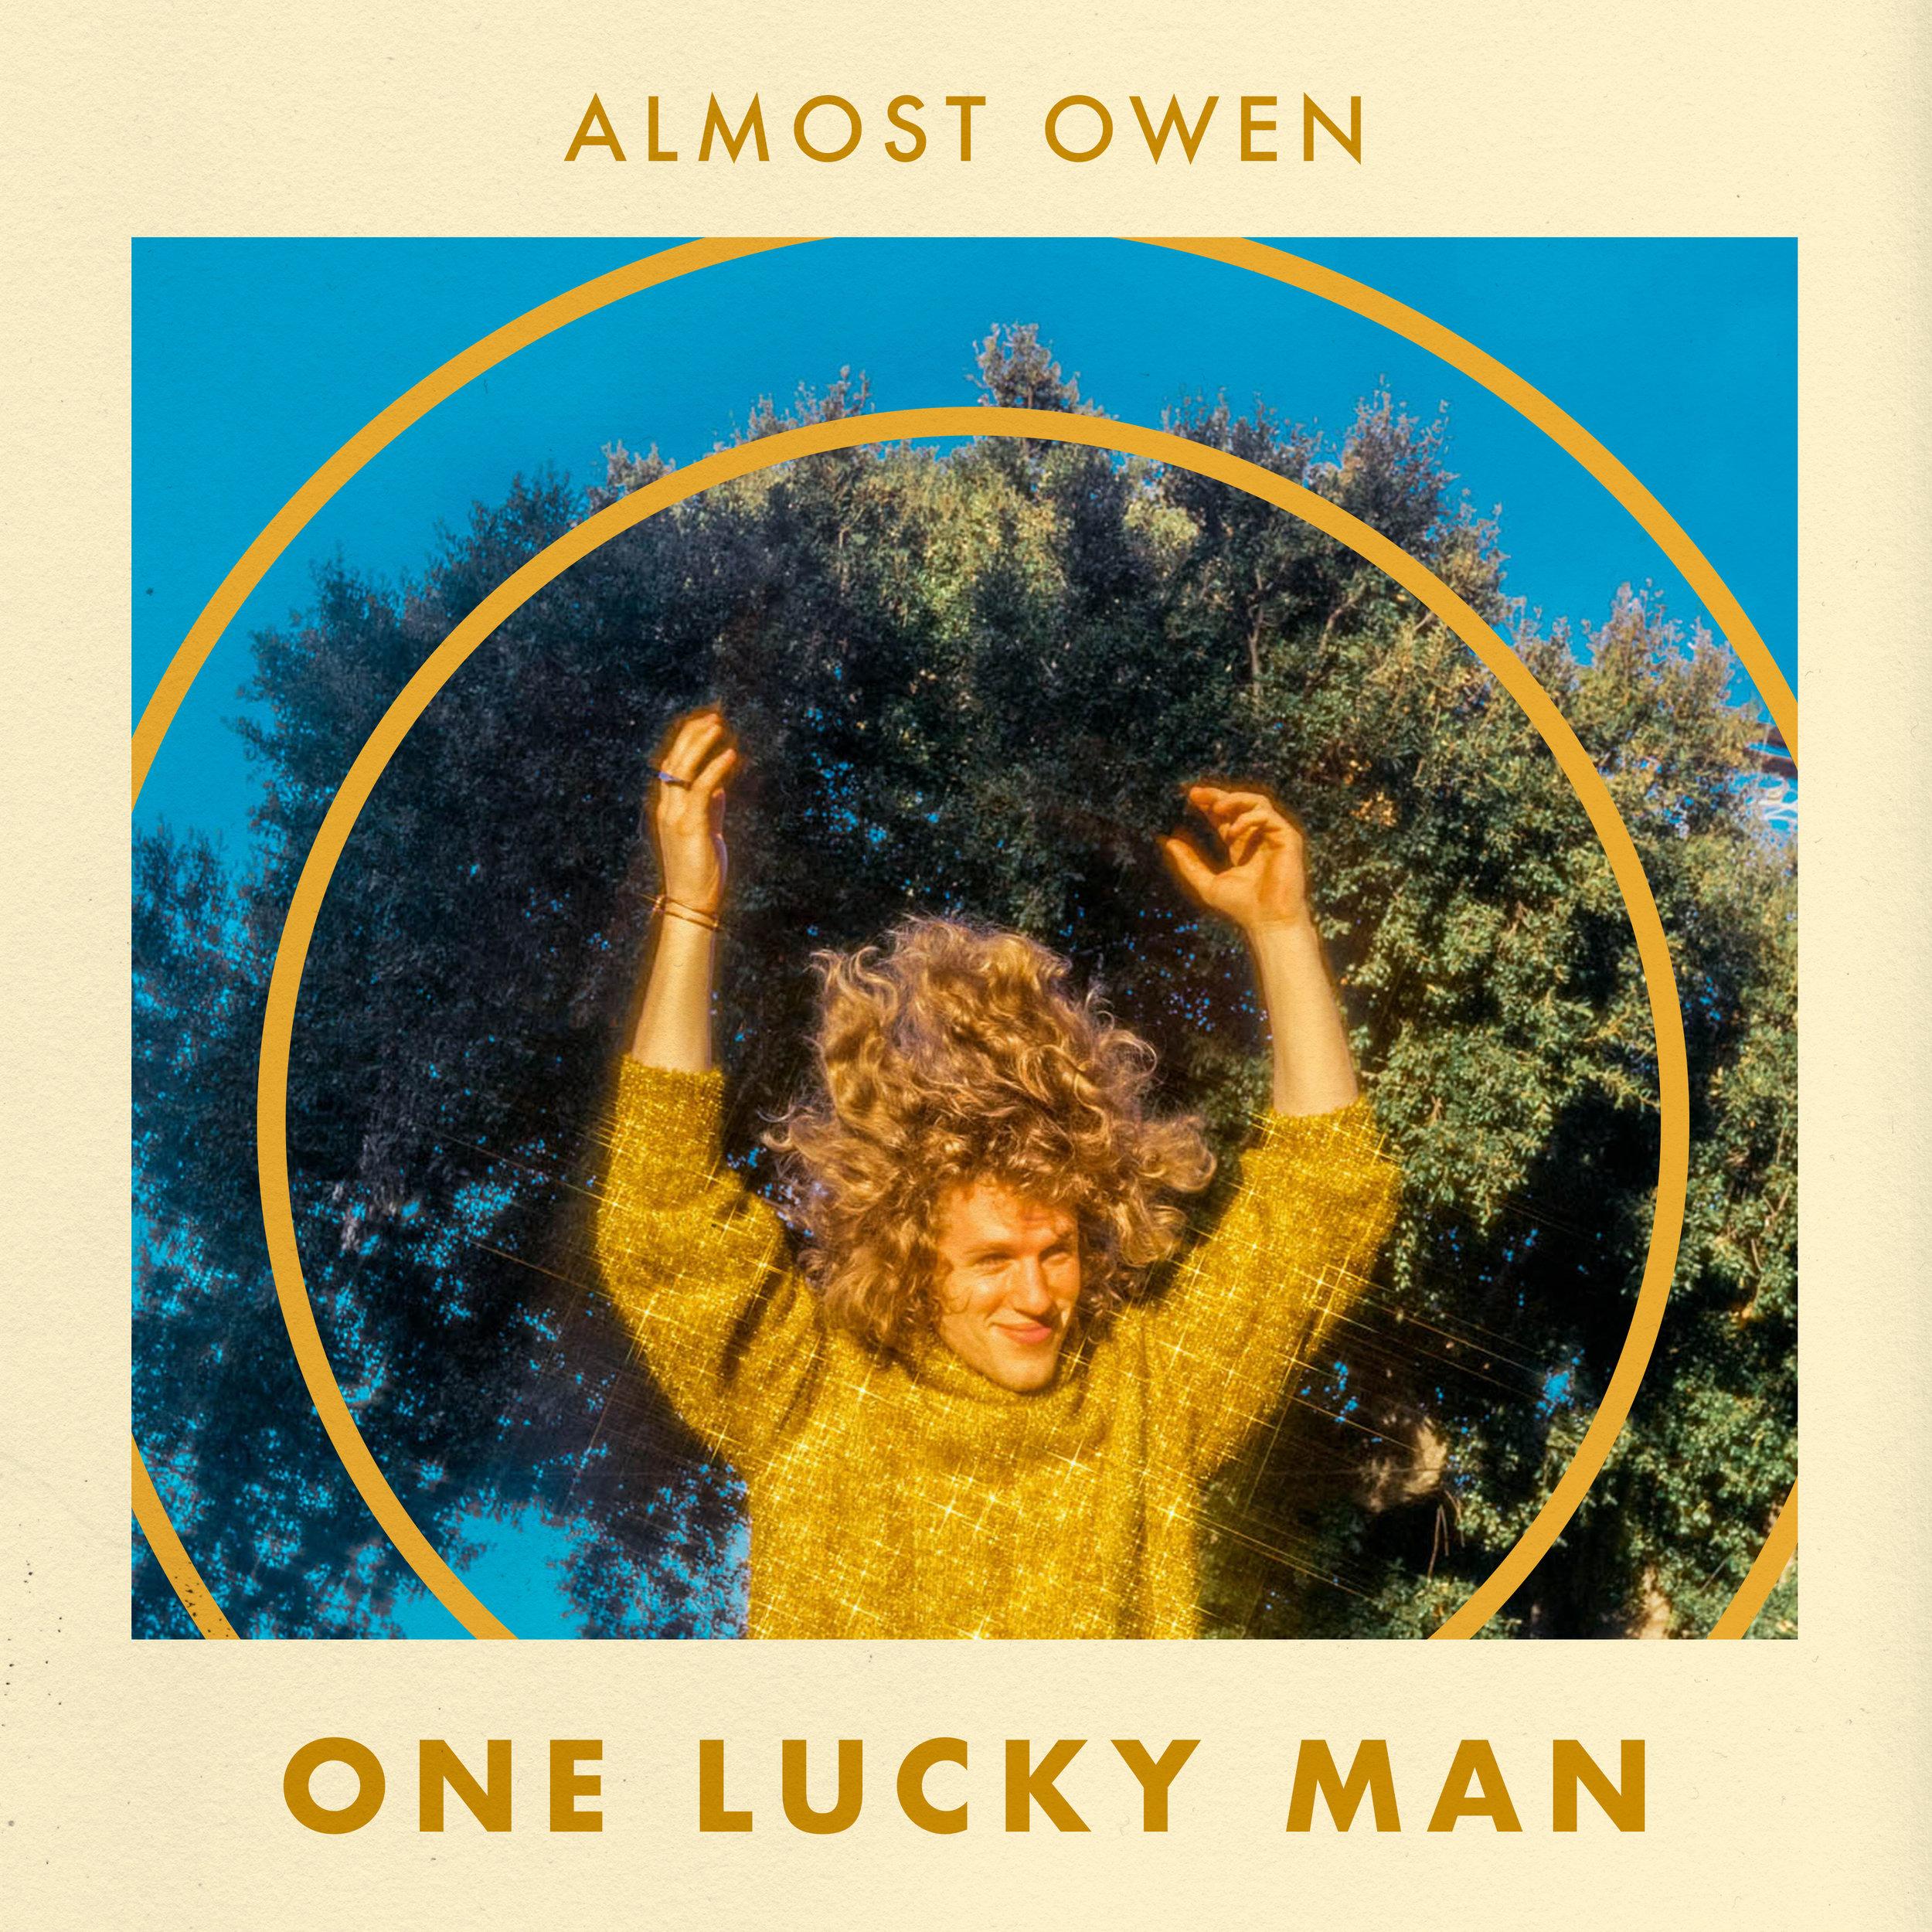 Almost Owen: One Lucky Man artwork